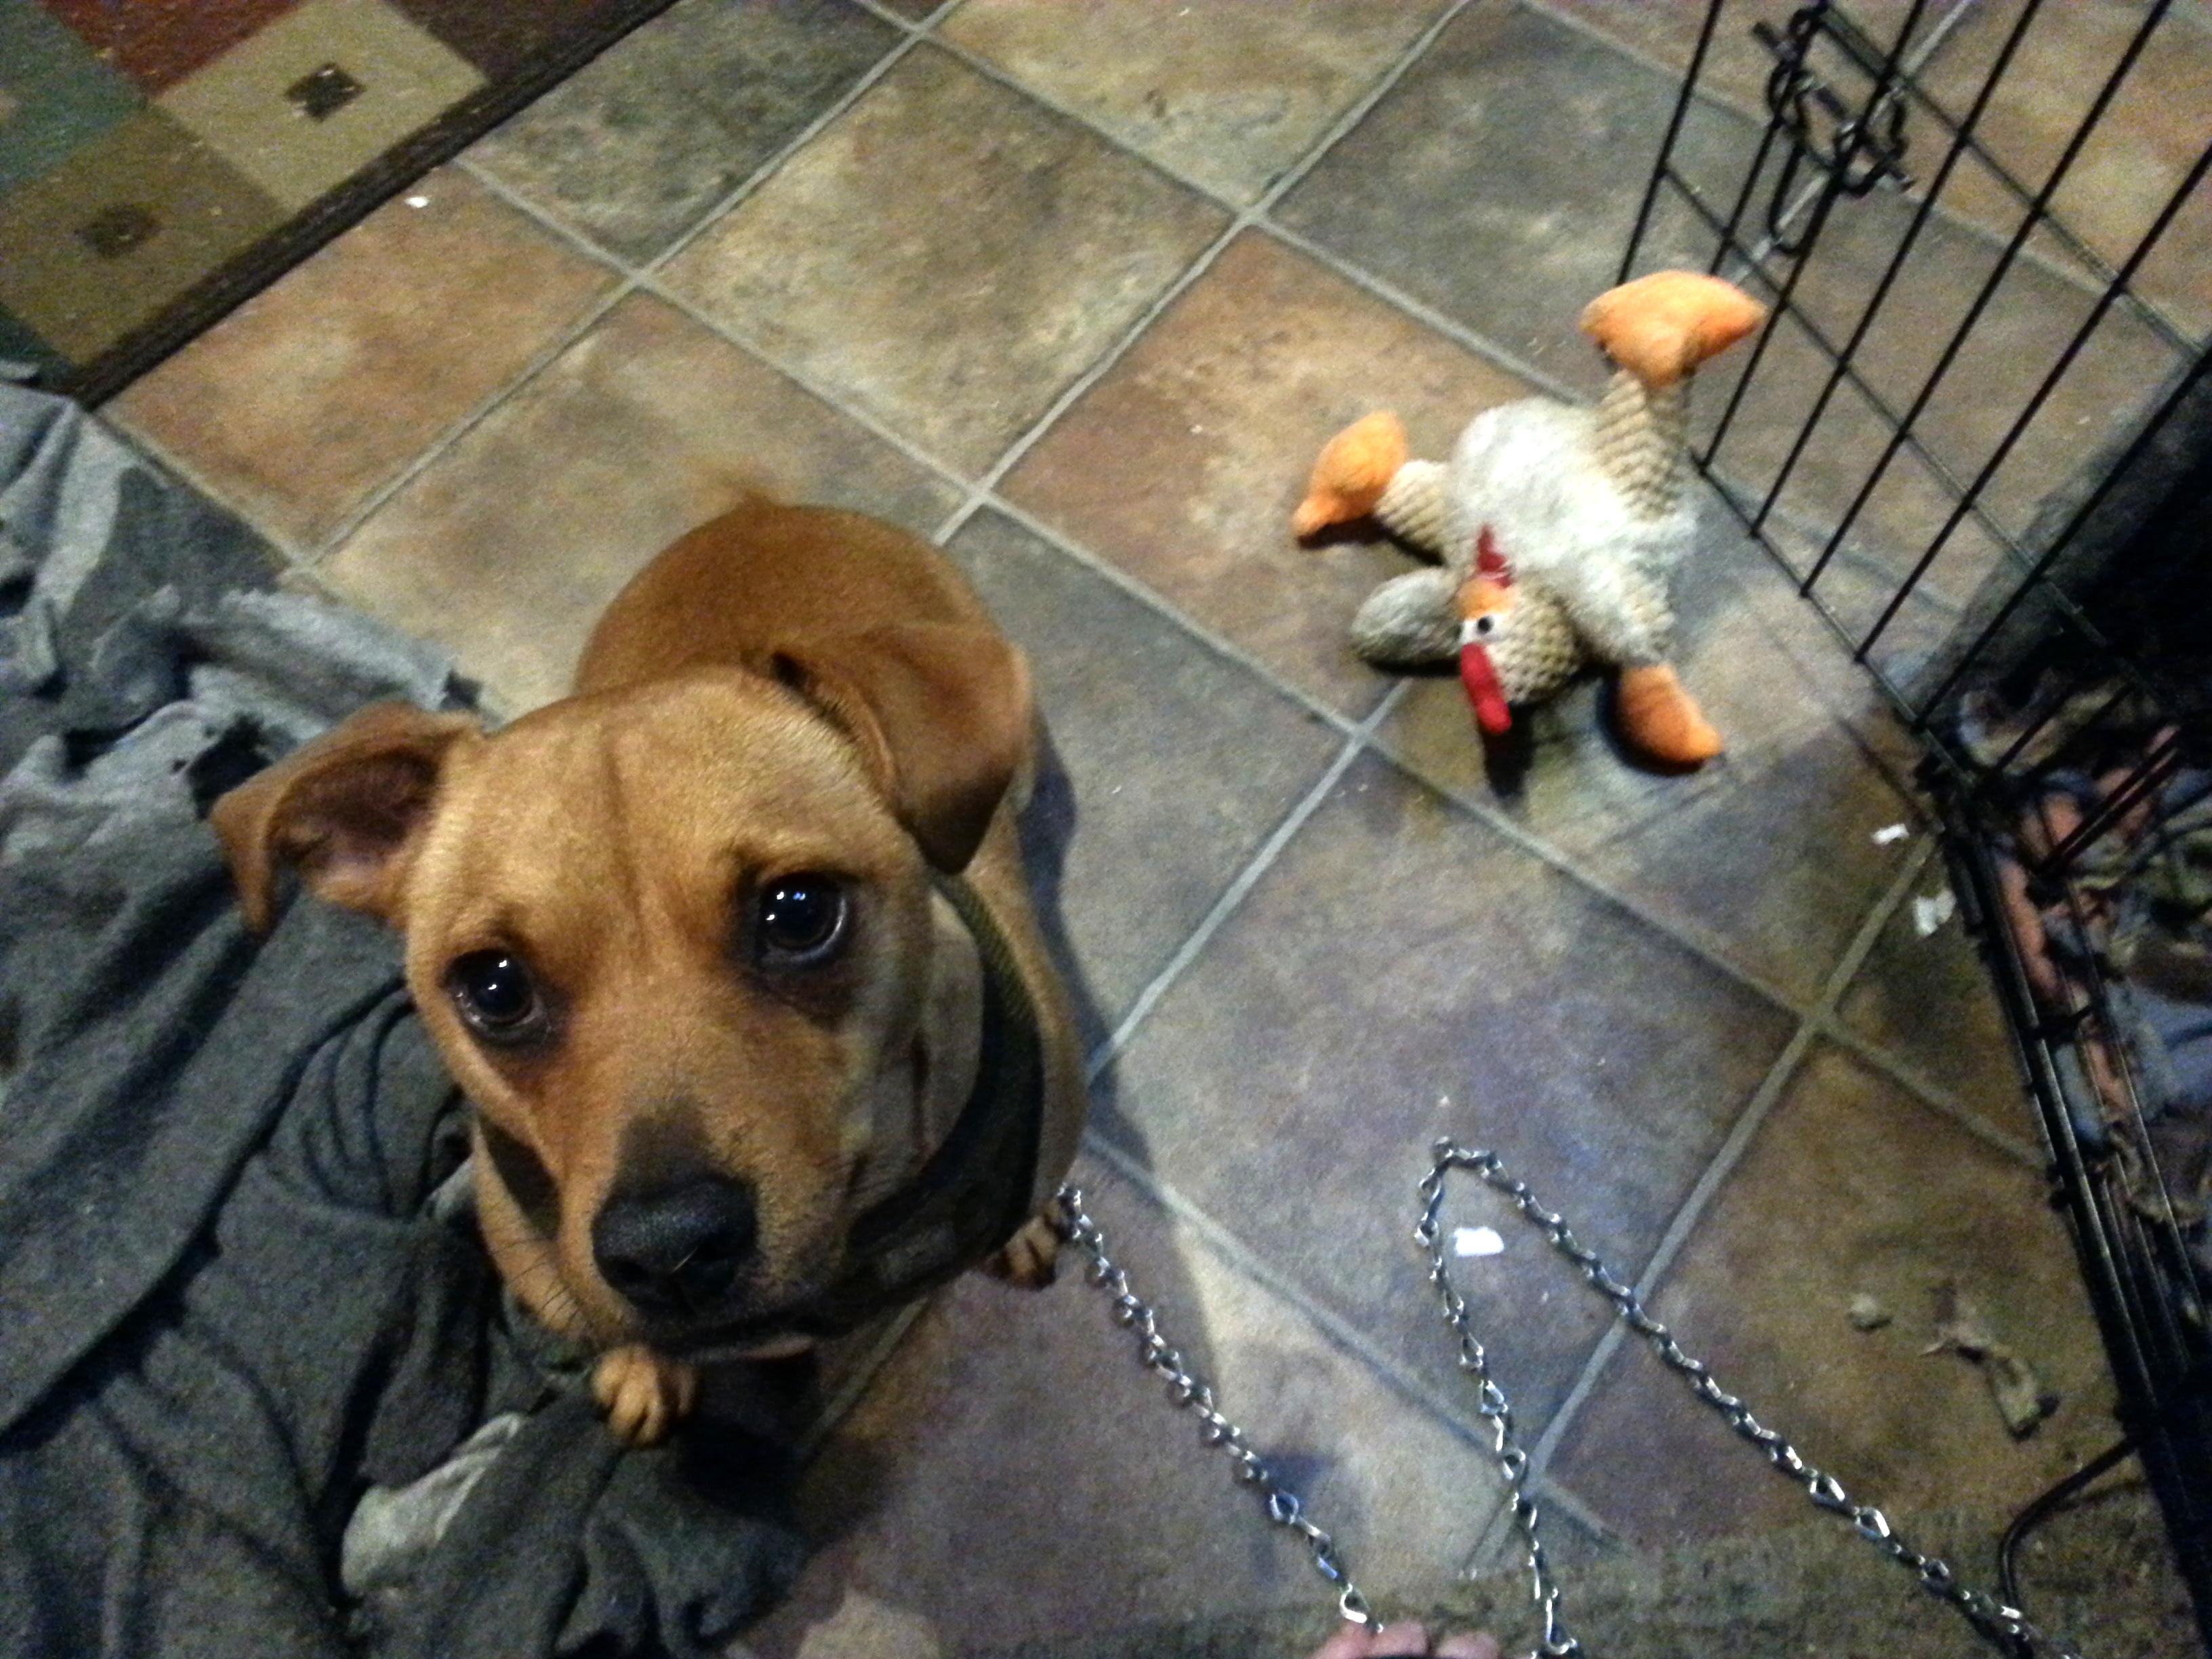 Pepi and the sad chicken